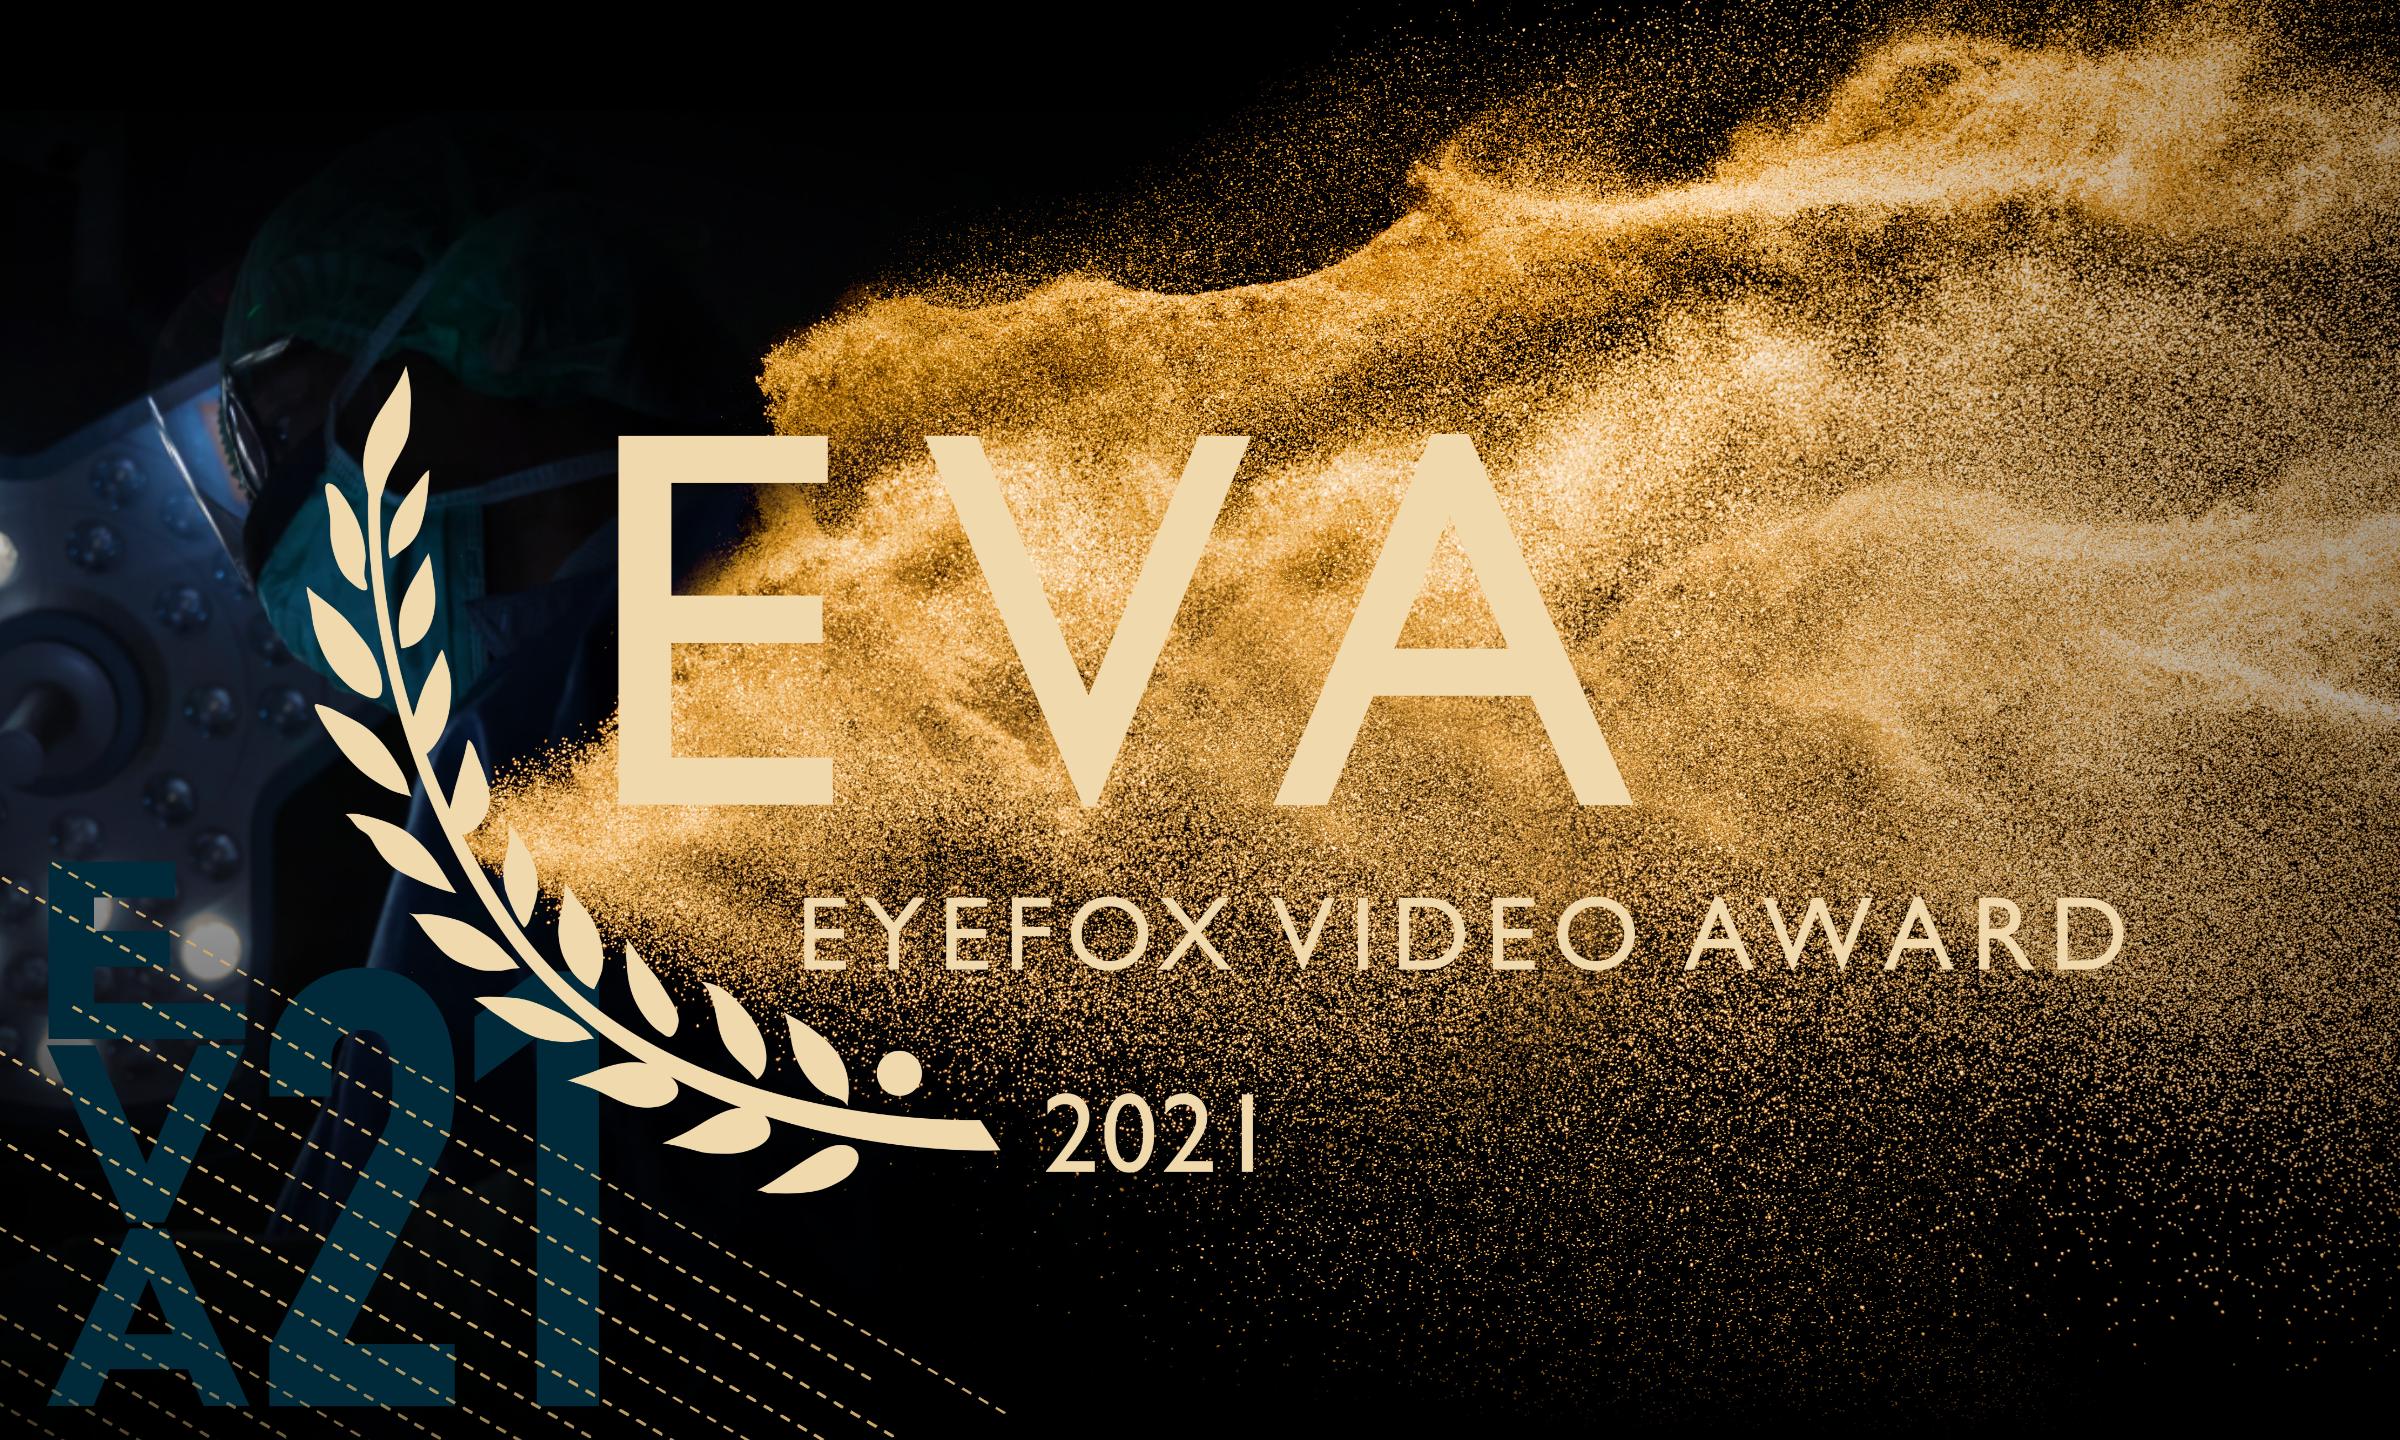 Der EYEFOX Video Award – 22. Januar 2021